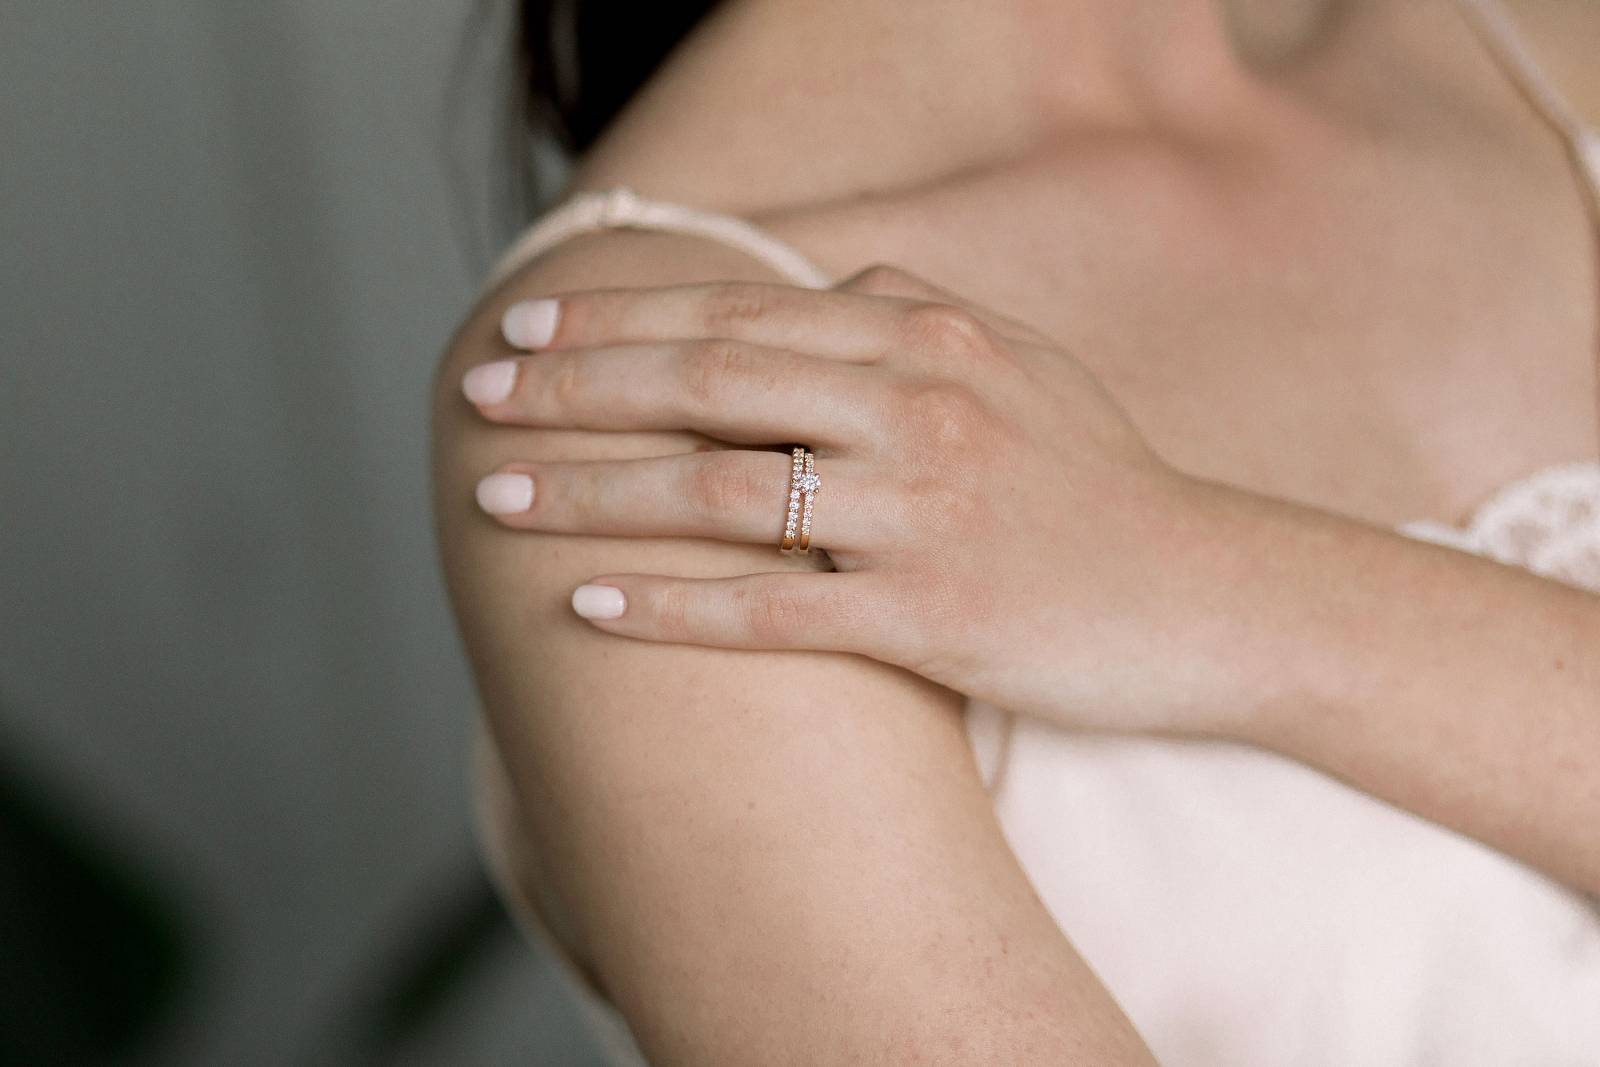 Scaldis_Fotograaf_Darina Miro3 - House of Weddings